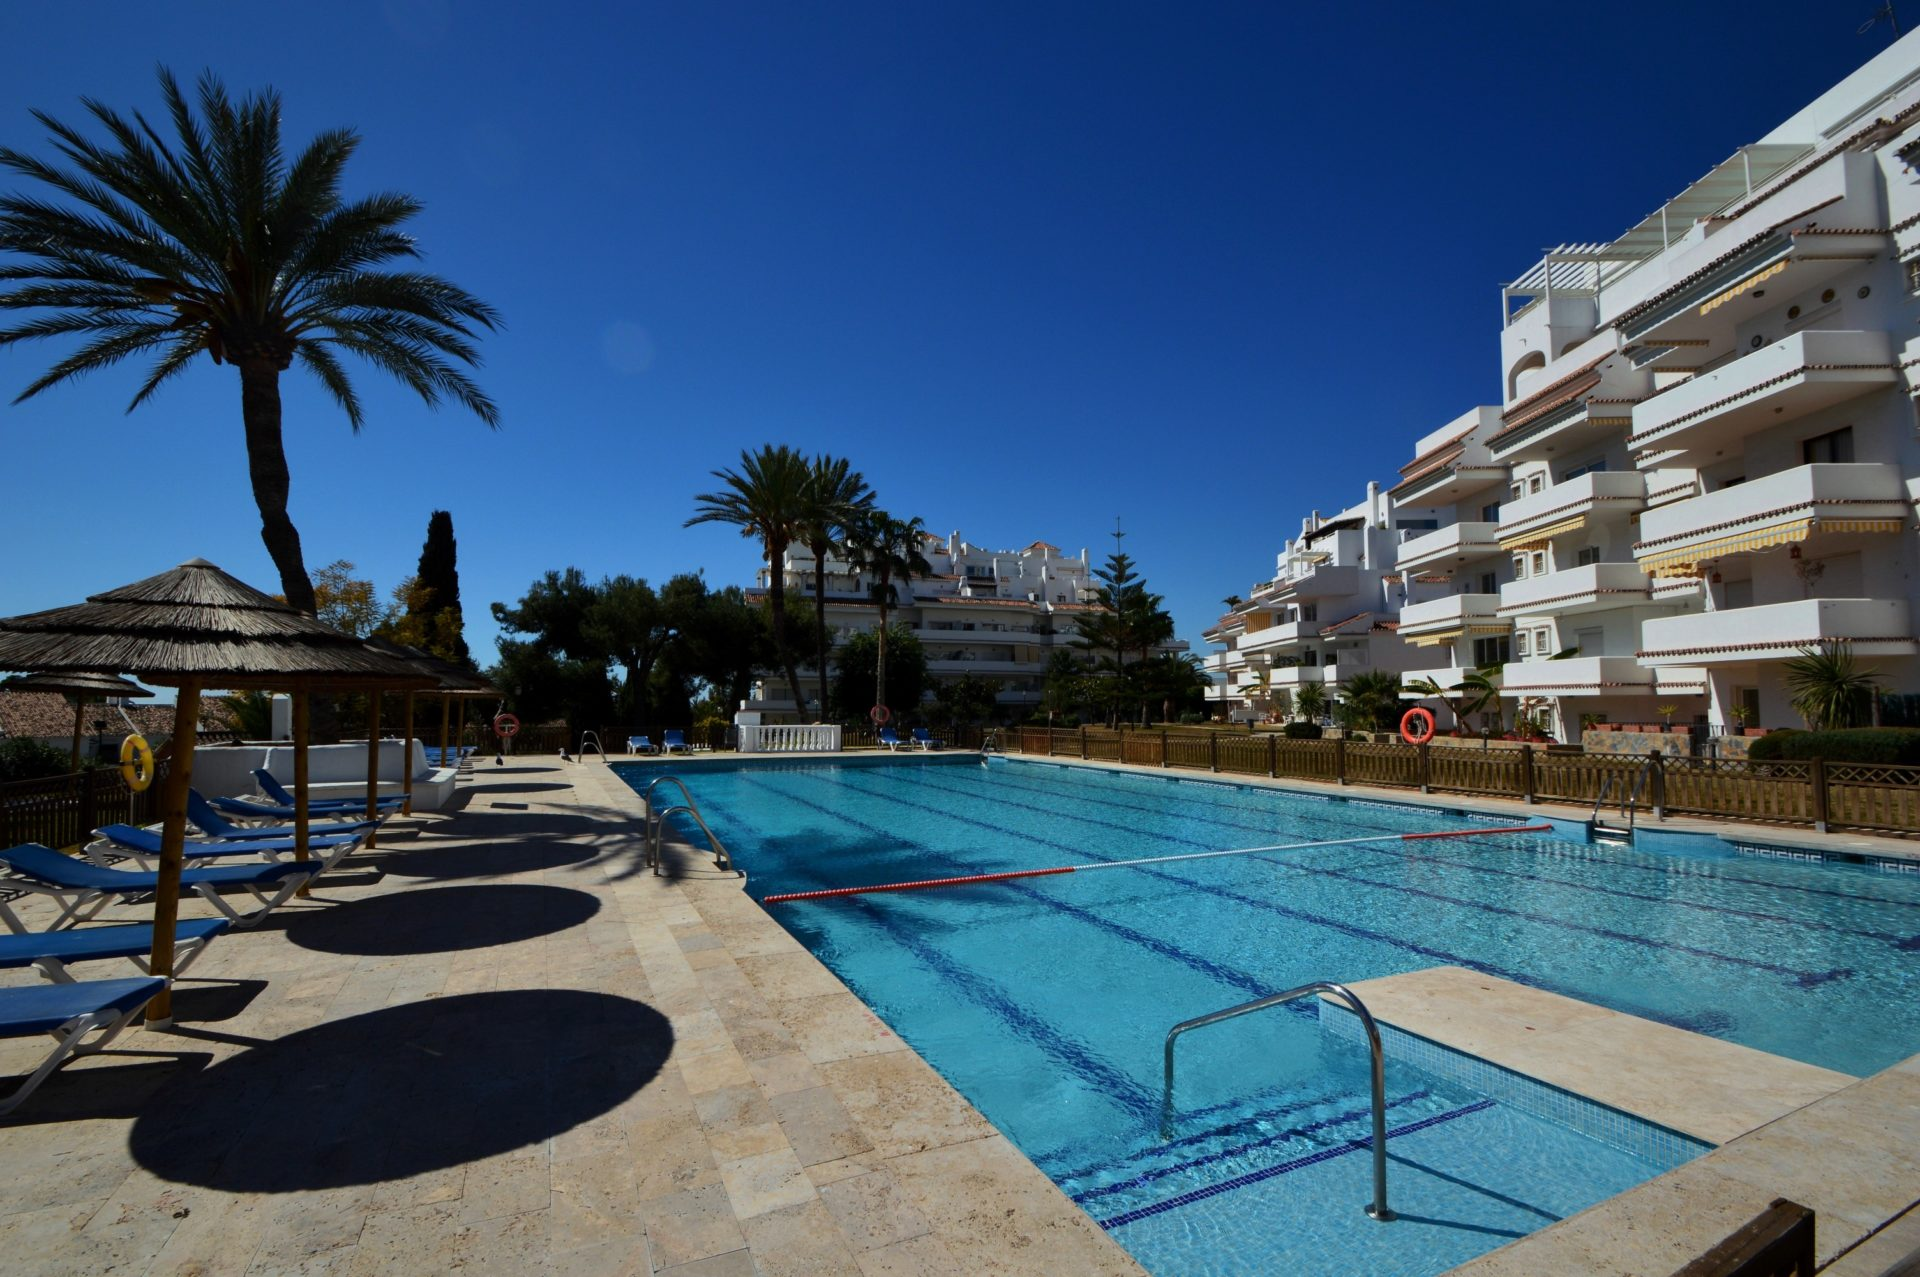 Elegant spacious garden apartment for sale in the best location of Nueva Andalucia